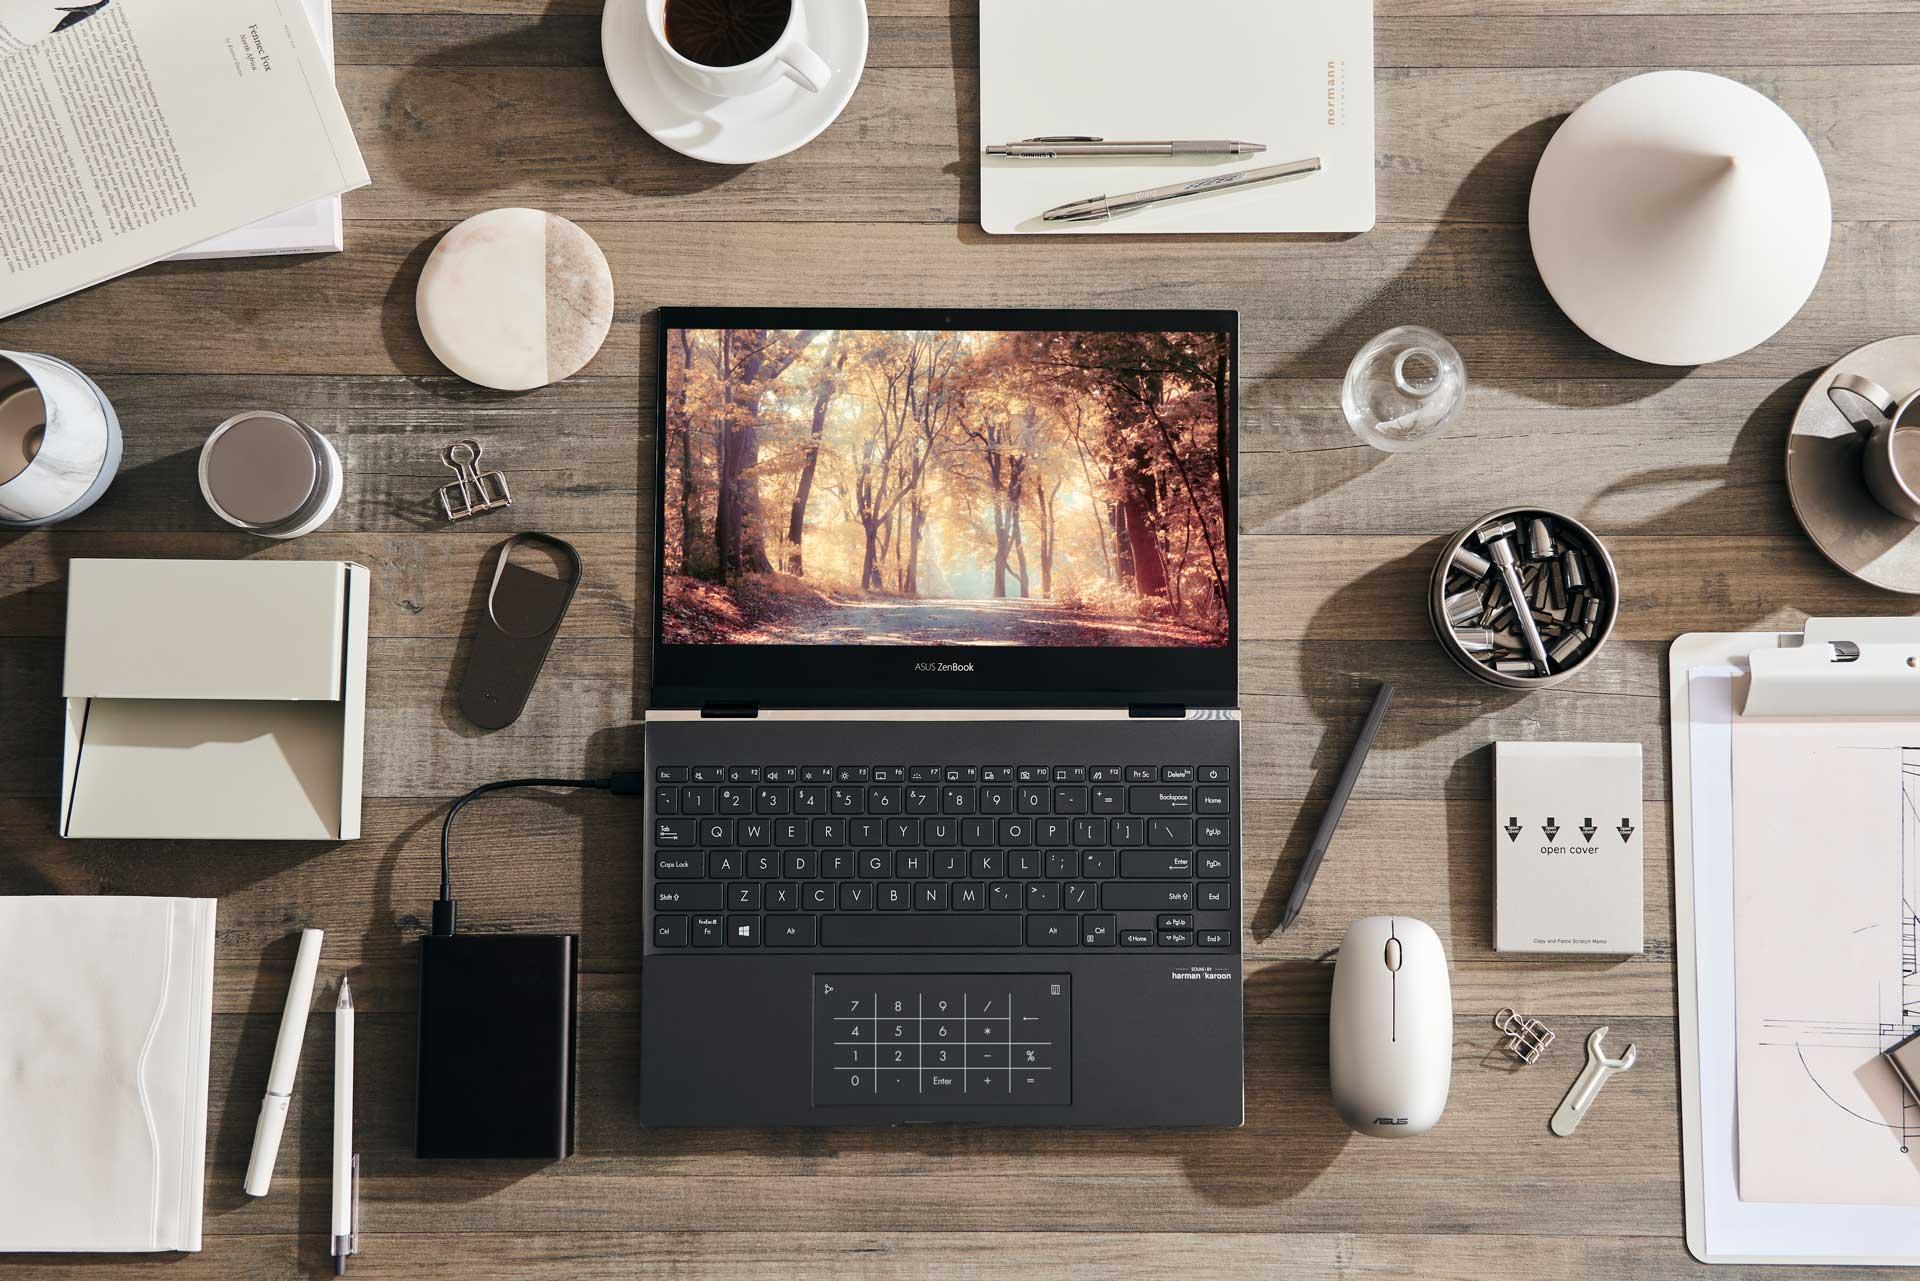 ASUS ZenBook Flip 13 South Africa